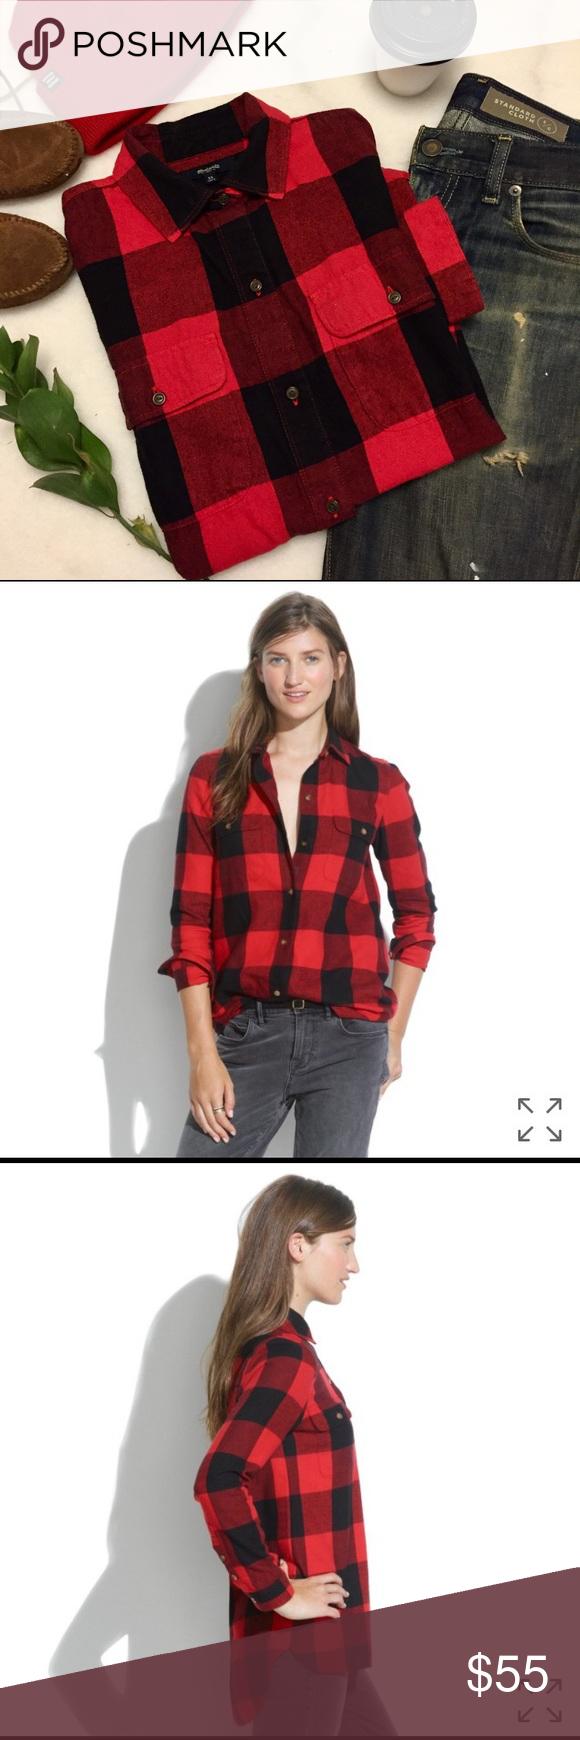 Flannel shirt xs  Madewell Plaid